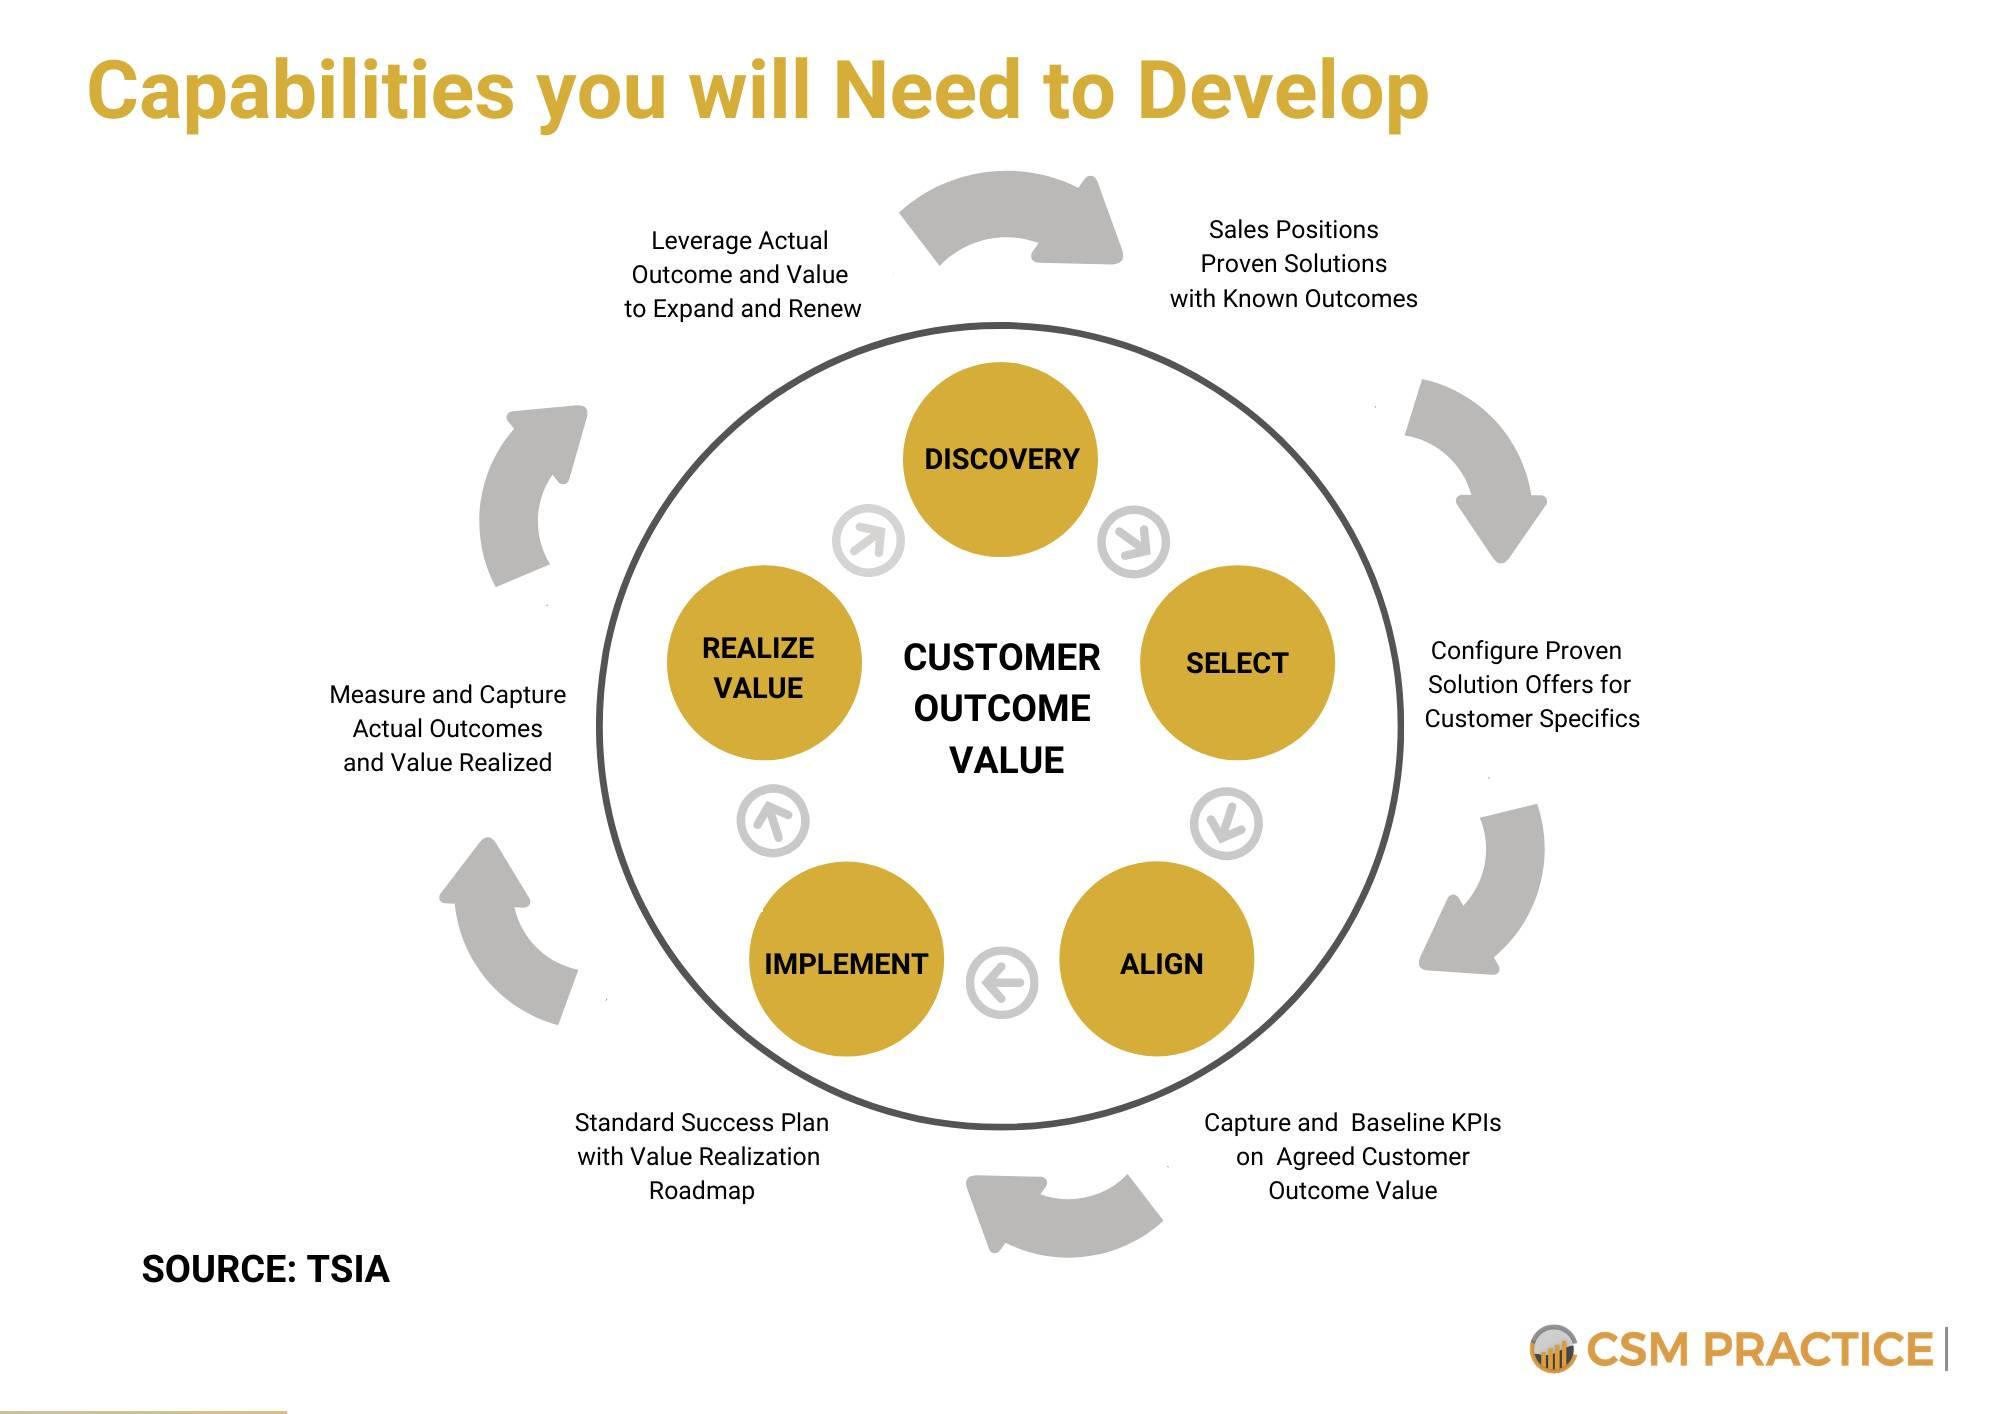 customer need to develop capabilities